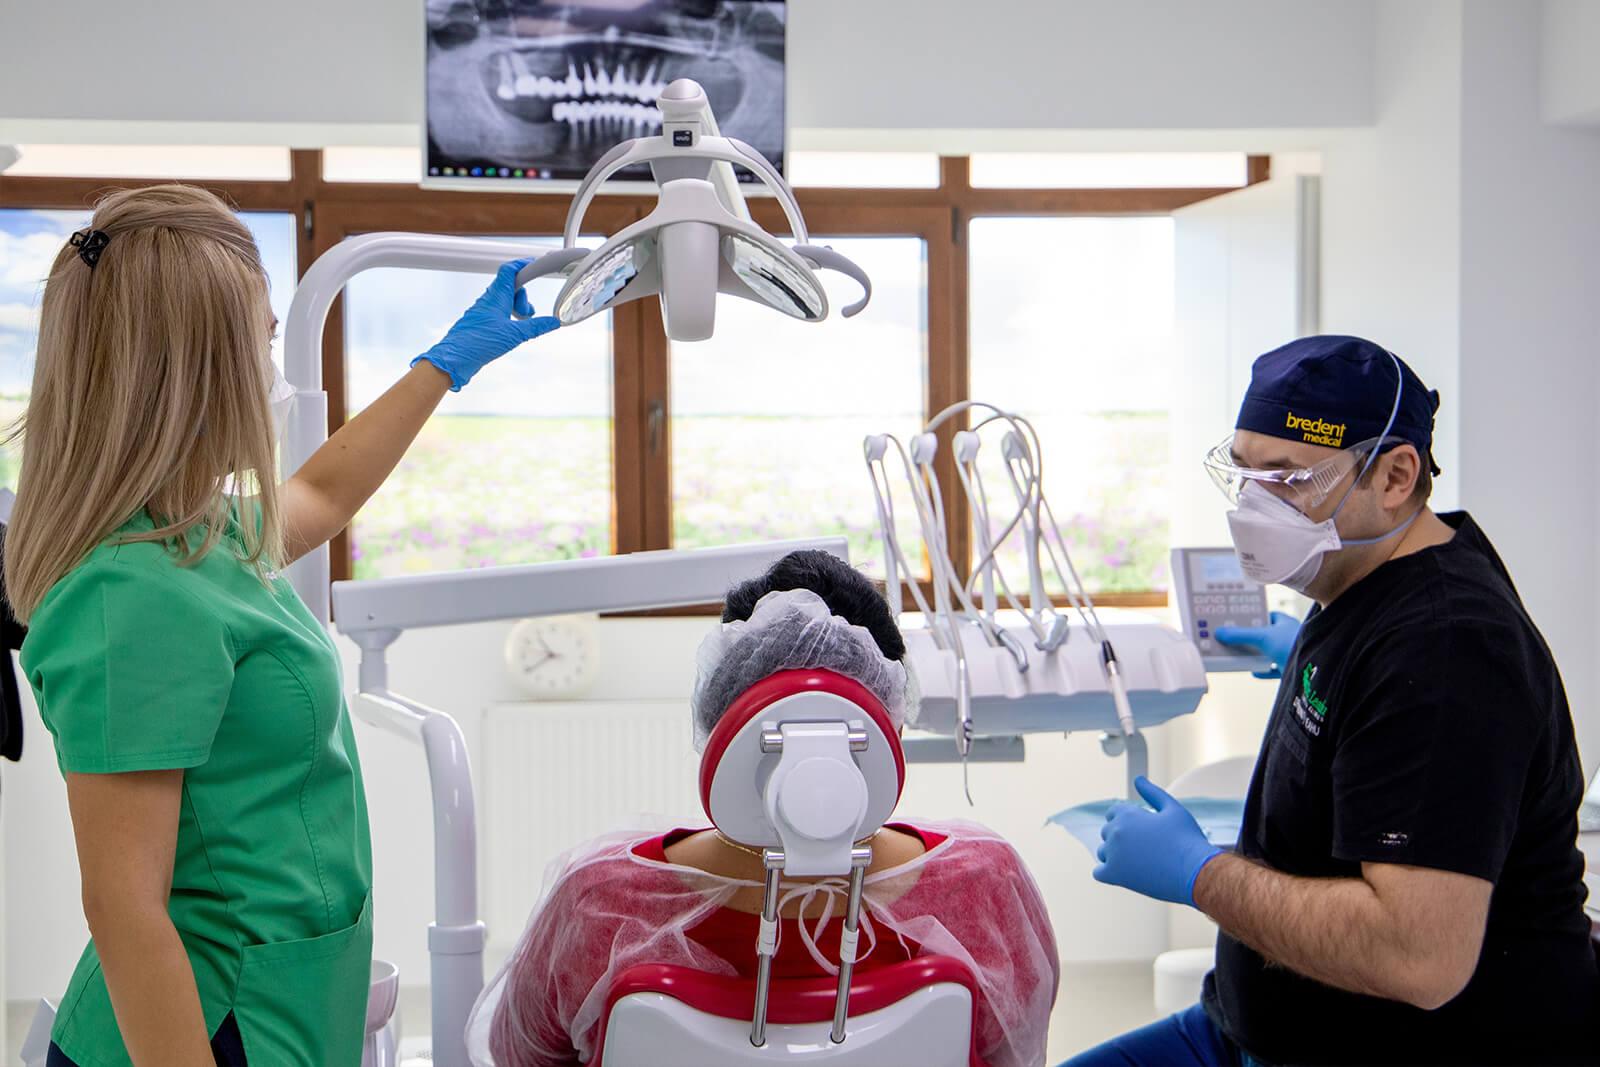 Pacienta in cabinetul stomatologic Dr. Leahu Sibiu, alaturi de medicul Ionut Leahu si asistenta